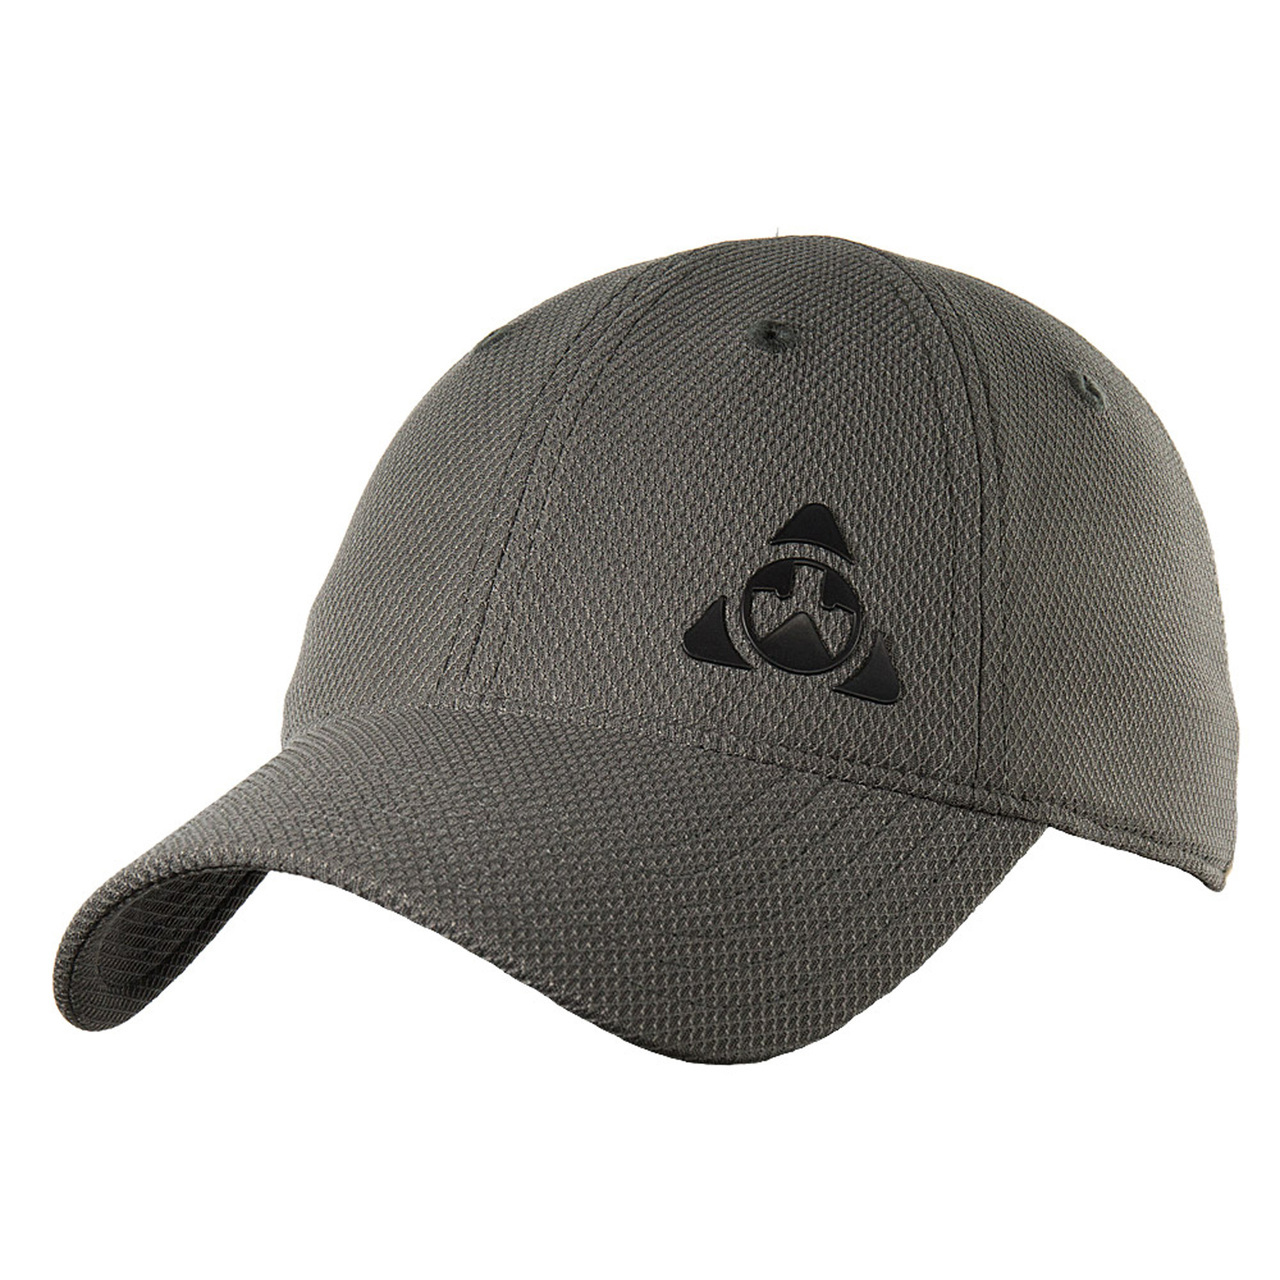 Magpul Core Cover Ballcap S/M Gray